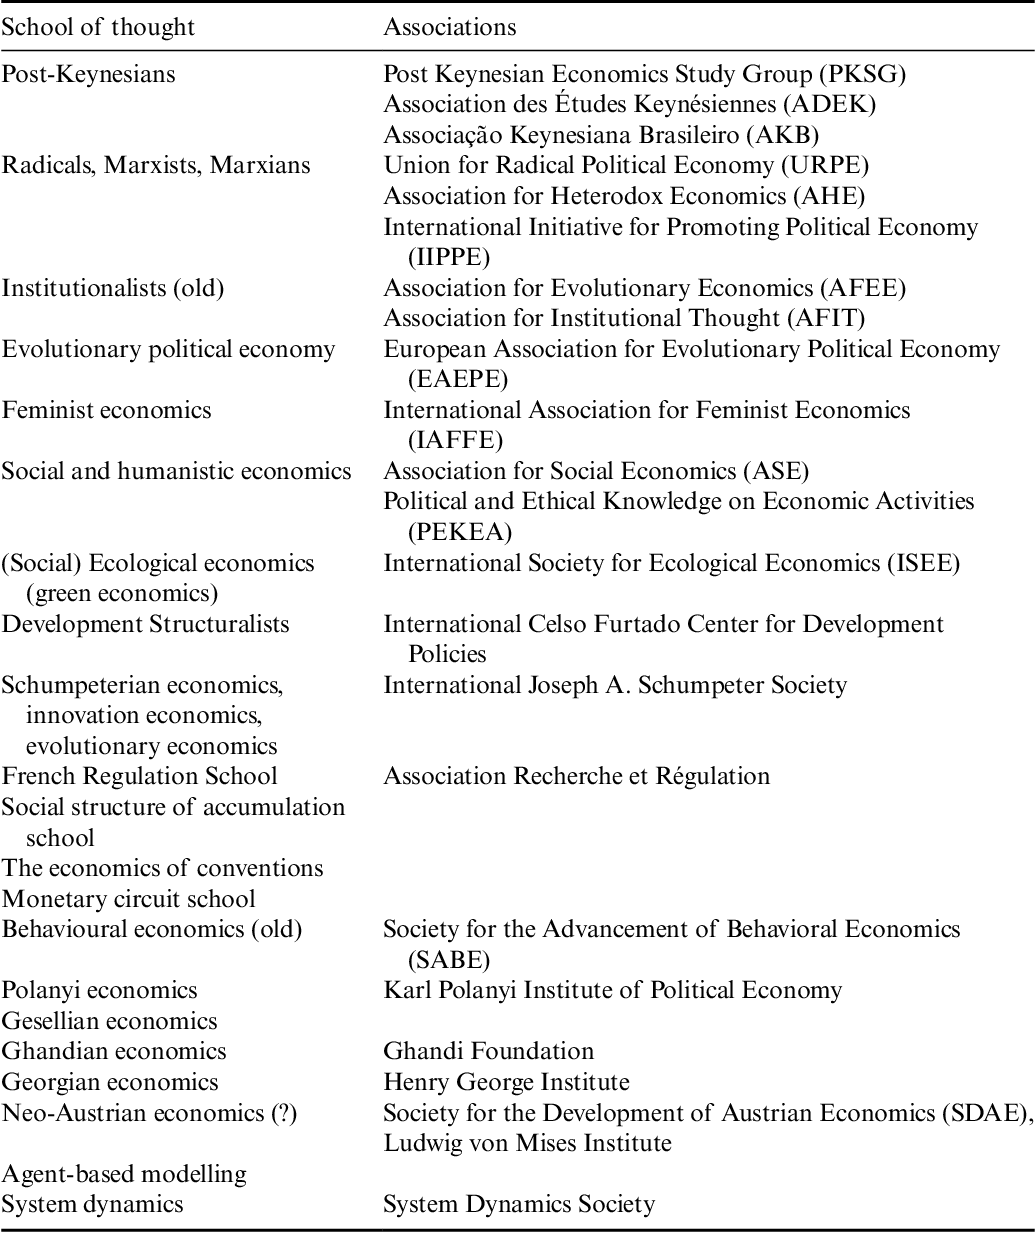 Table 1 2 from Essentials of heterodox and post-Keynesian